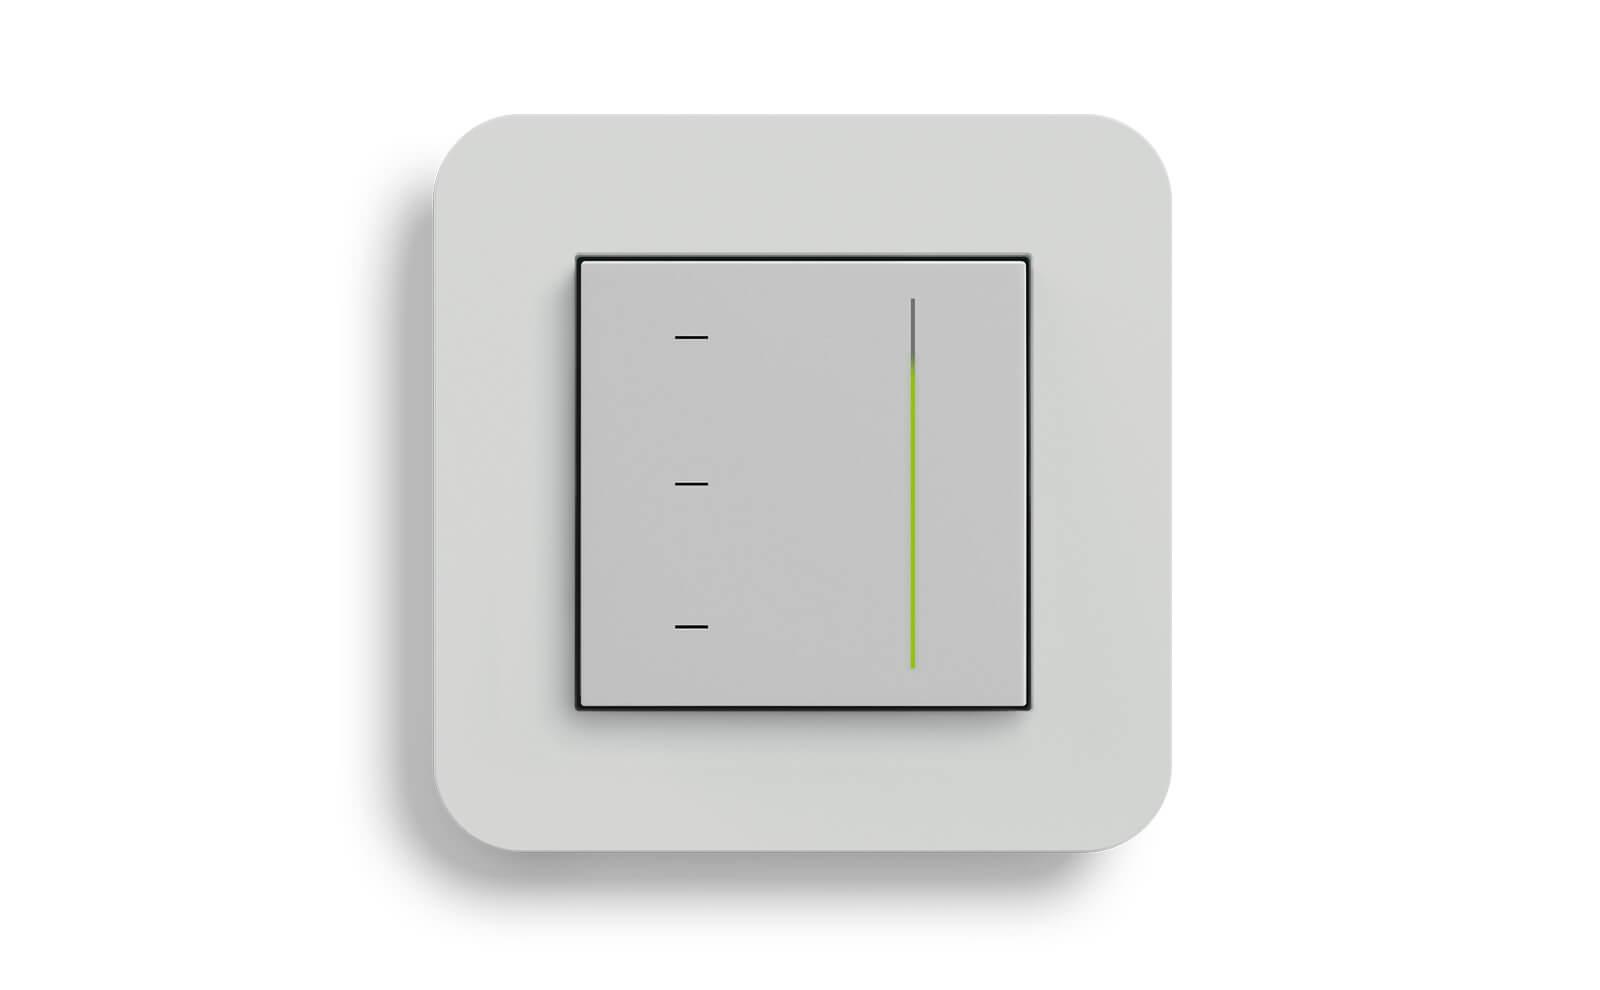 Gira System 3000 Touchaufsatz zur Jalousiesteuerung mit dem Rahmen Gira E3